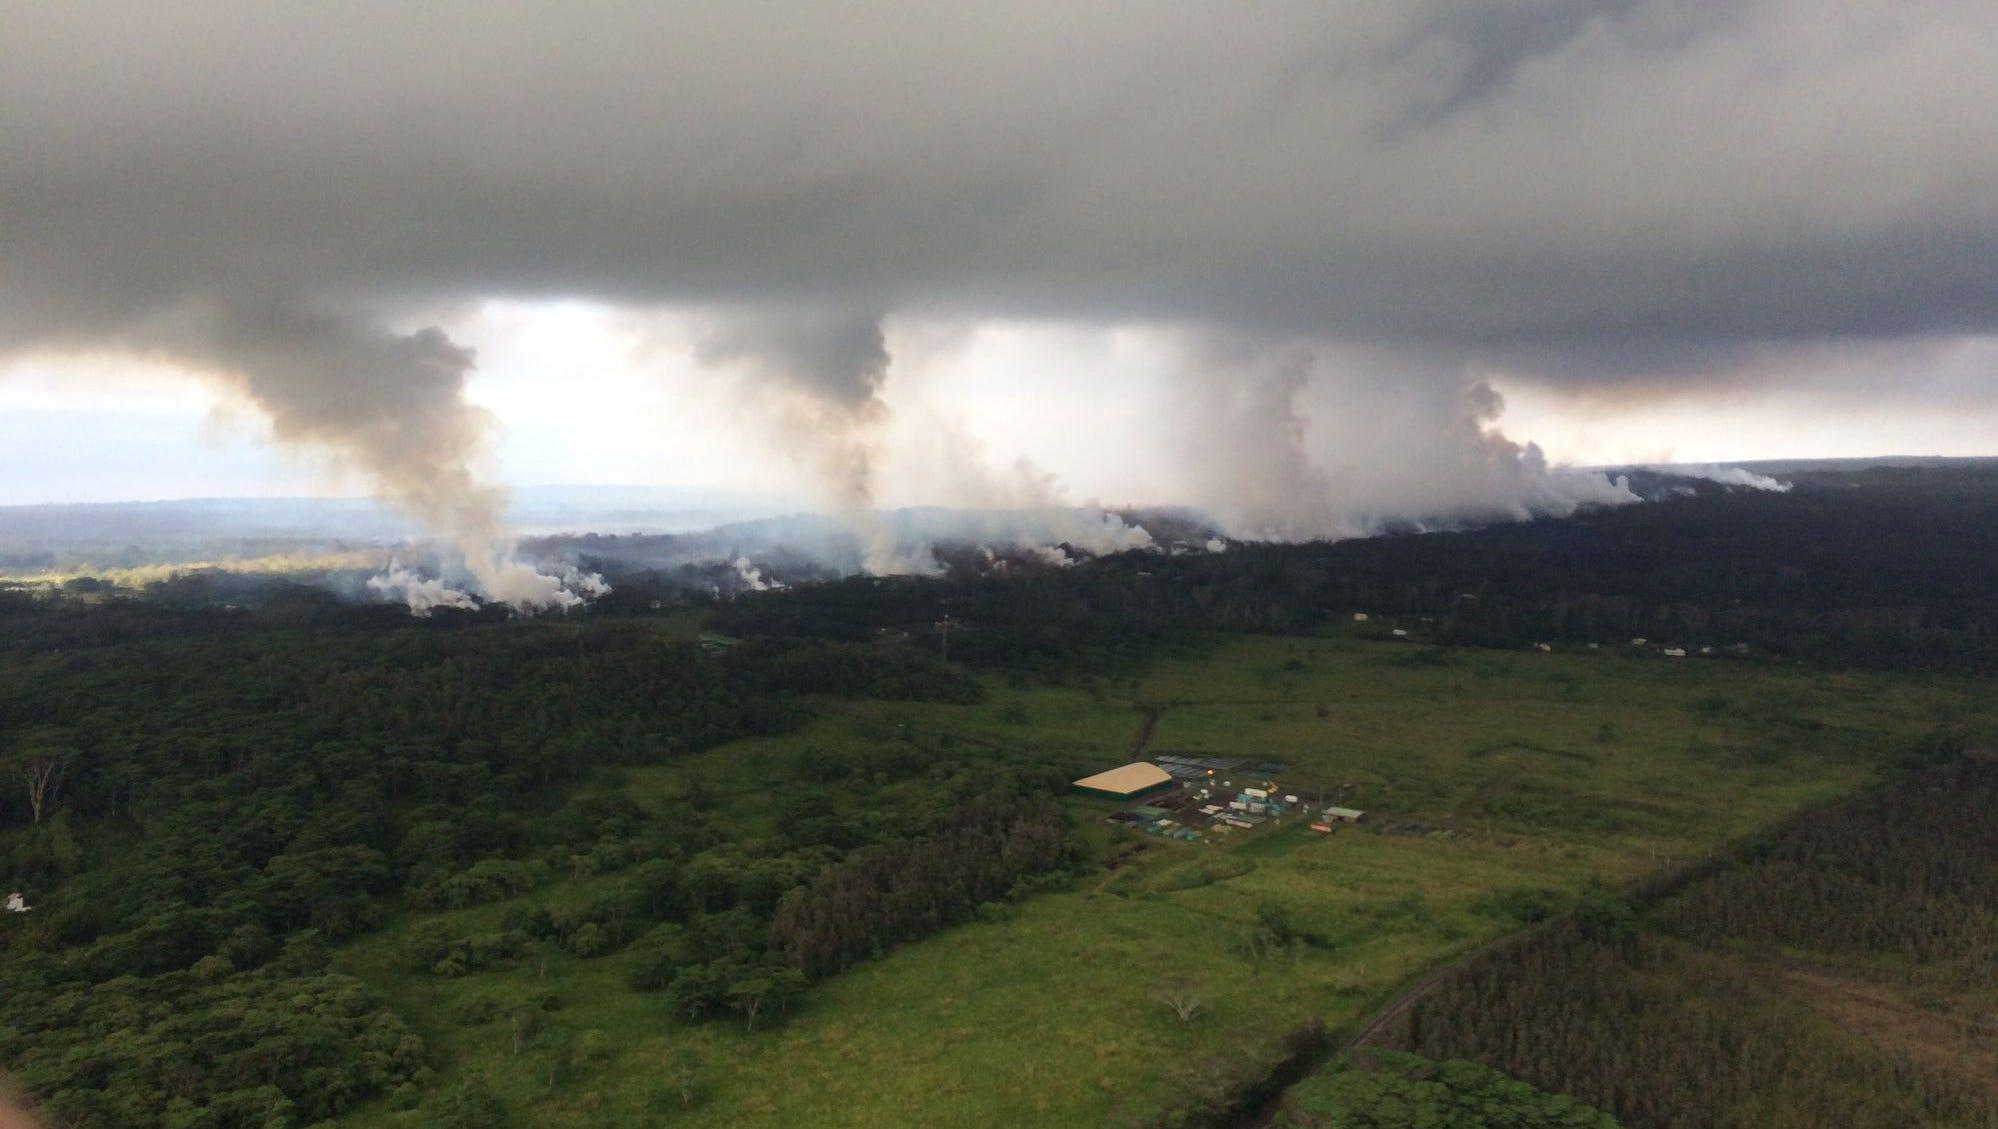 Hawaii Volcano Eruption Spews Plume 30 000 Feet Up